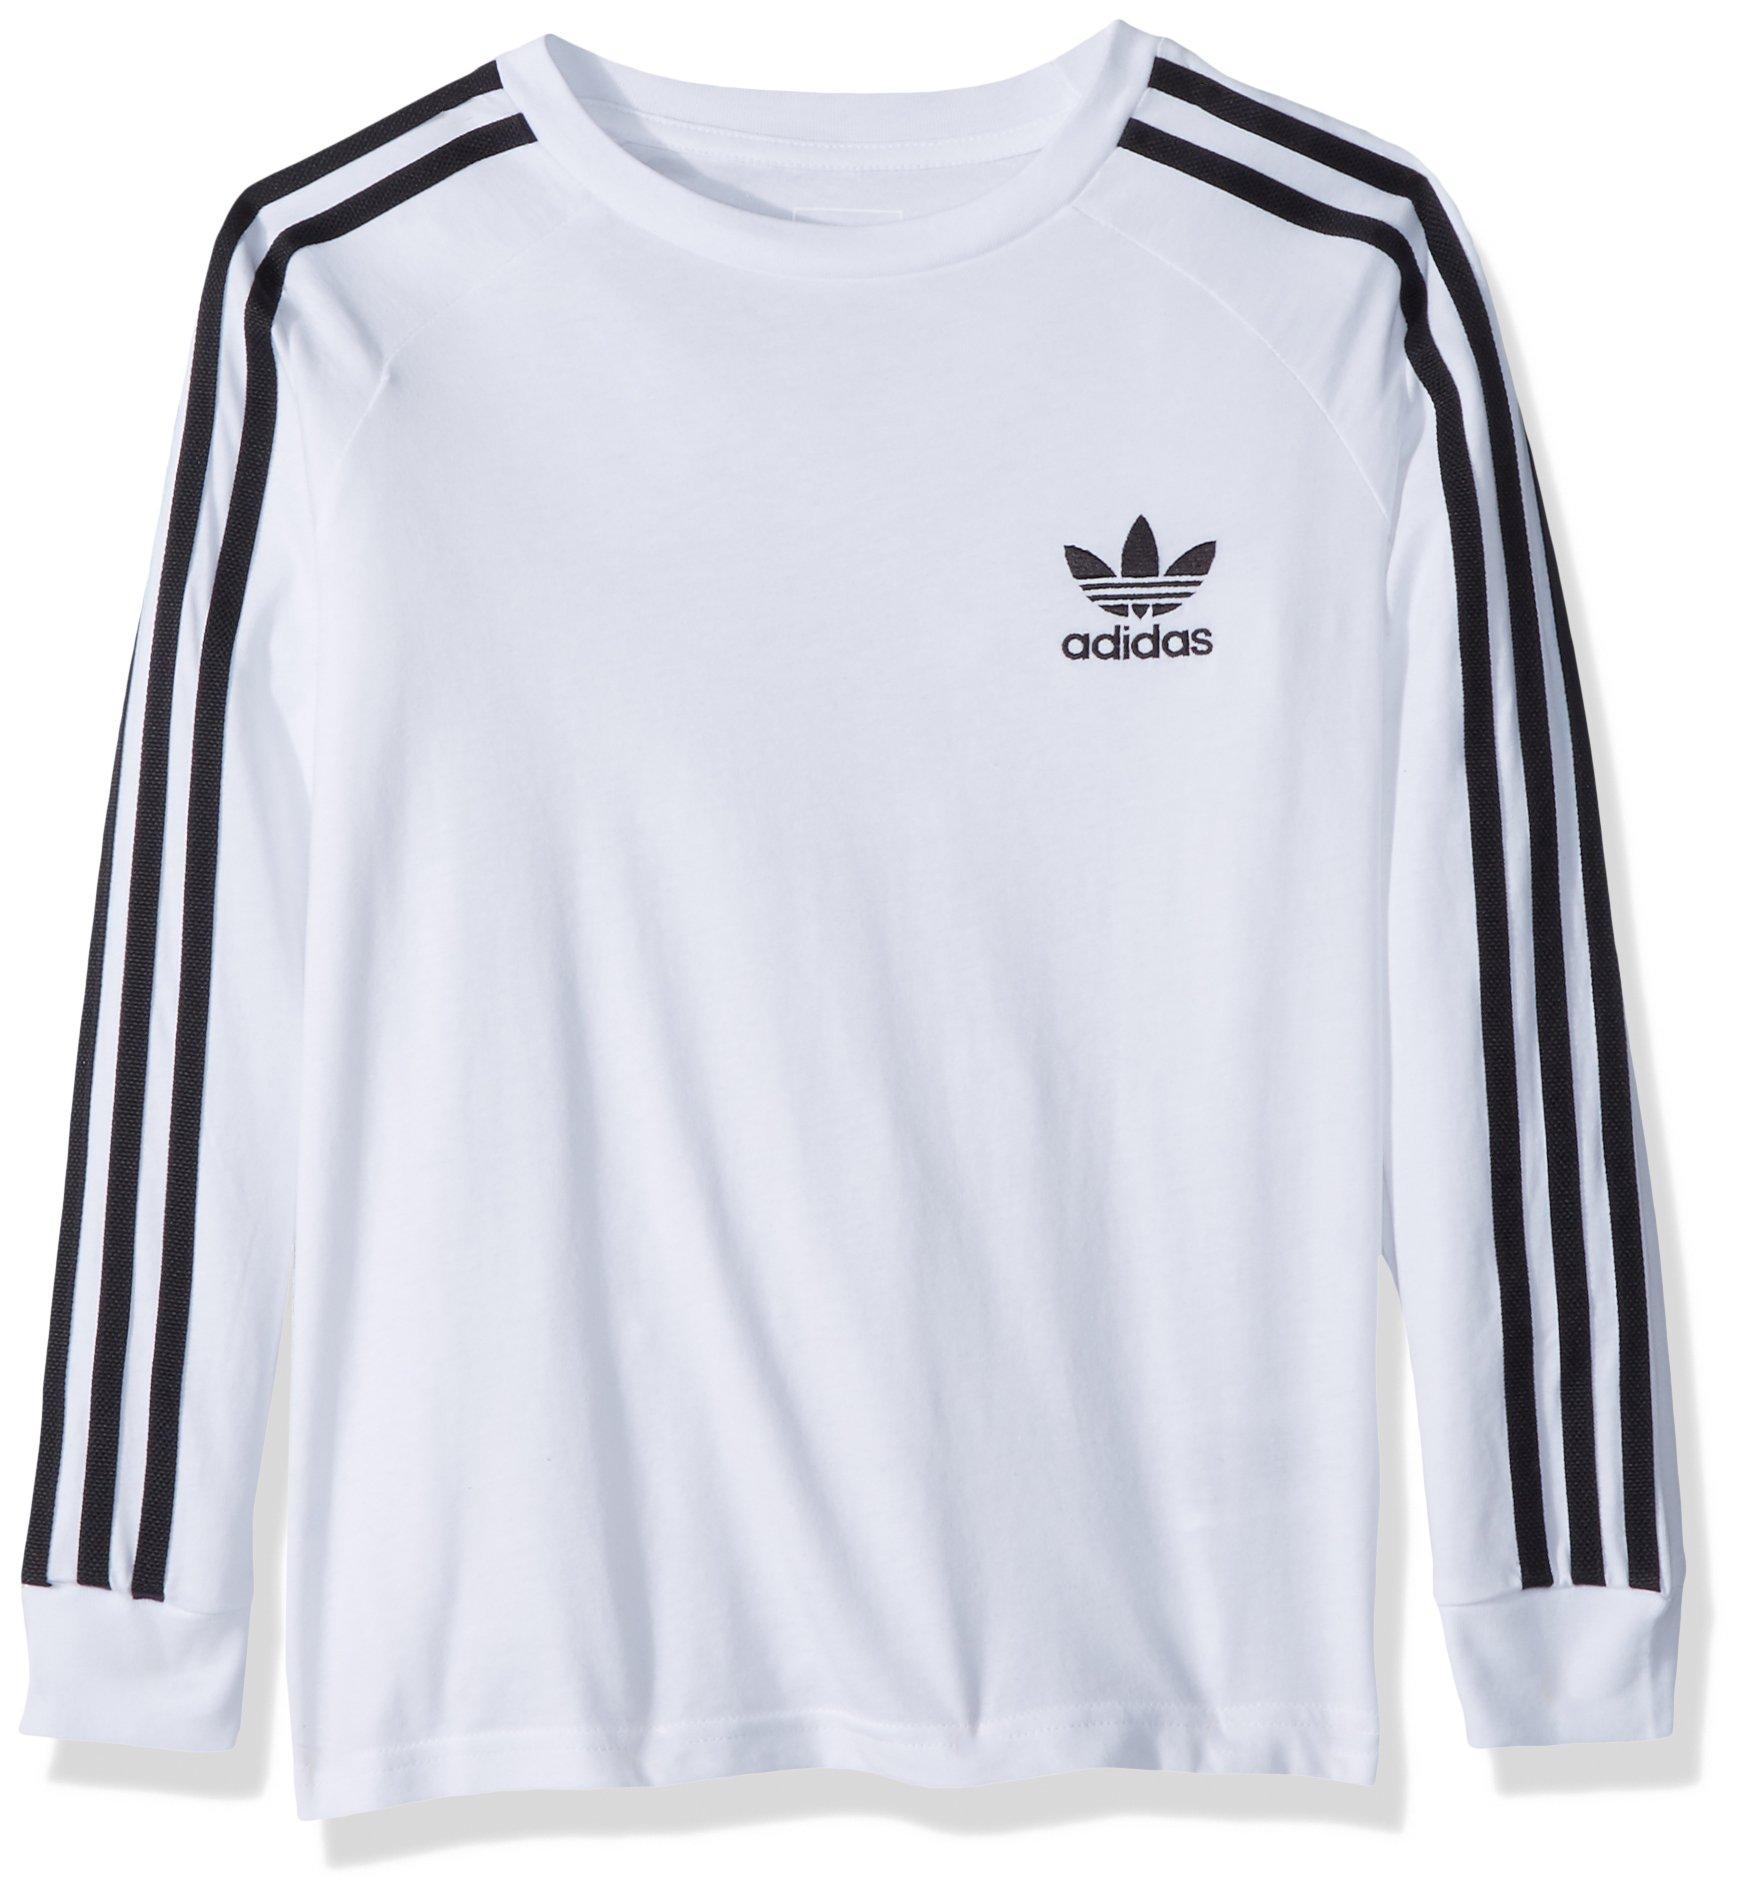 adidas Originals Big Boys' Originals California Long Sleeve Tee, White/Black, L